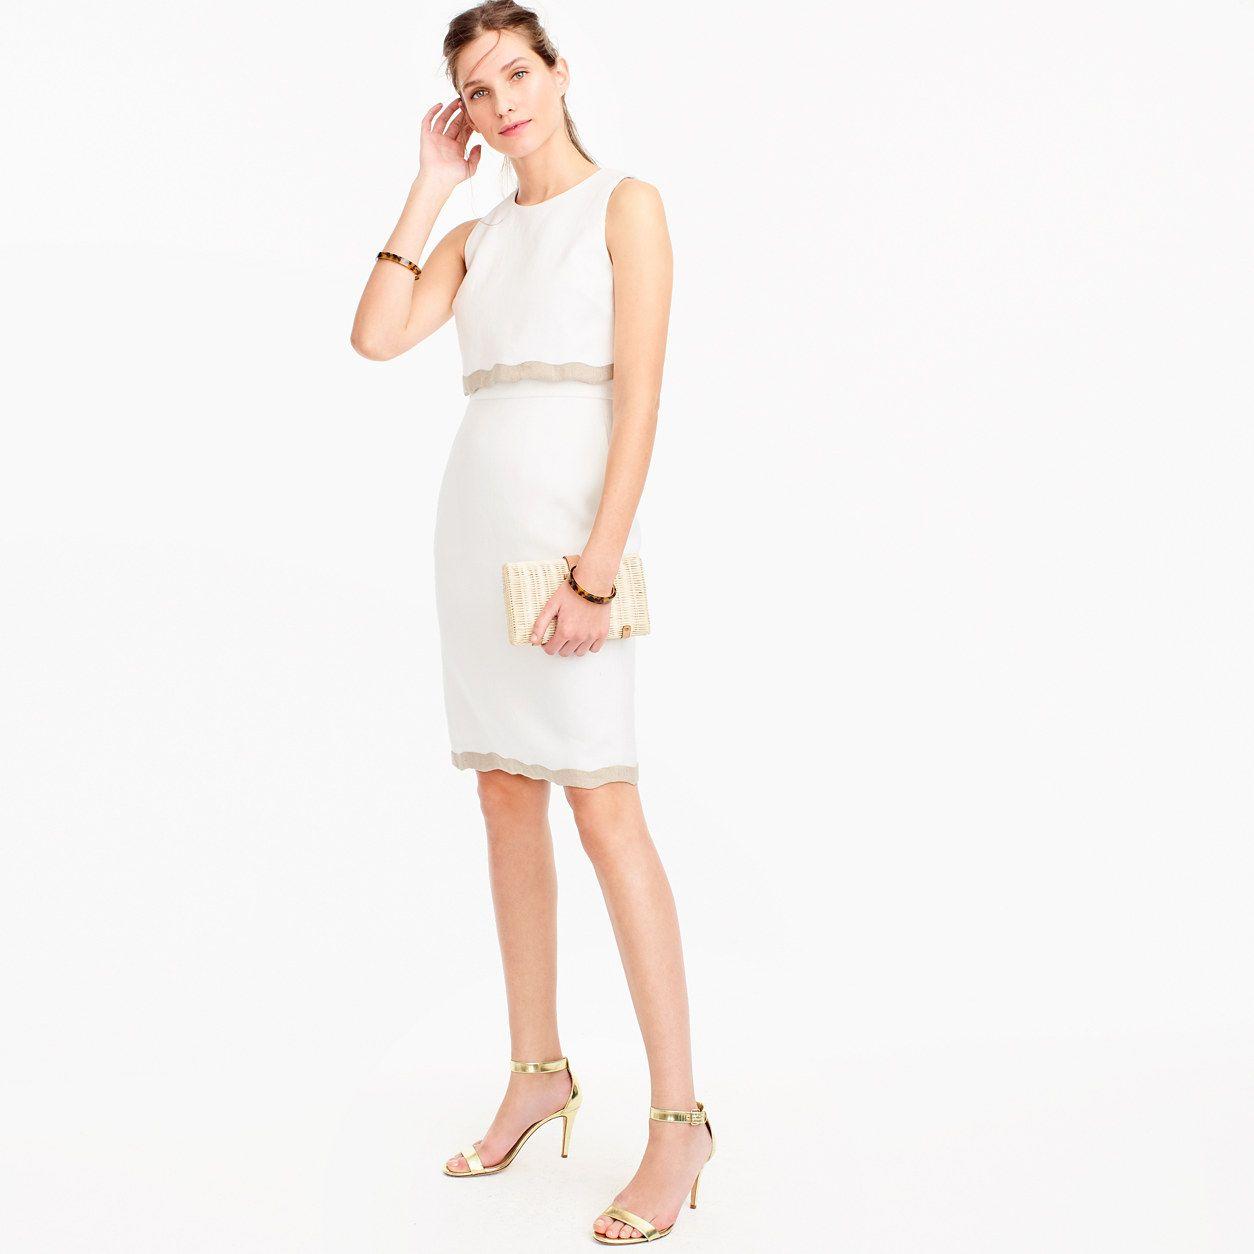 J Crew Womens Petite Going Places Dress In Linen Size 00 Petite